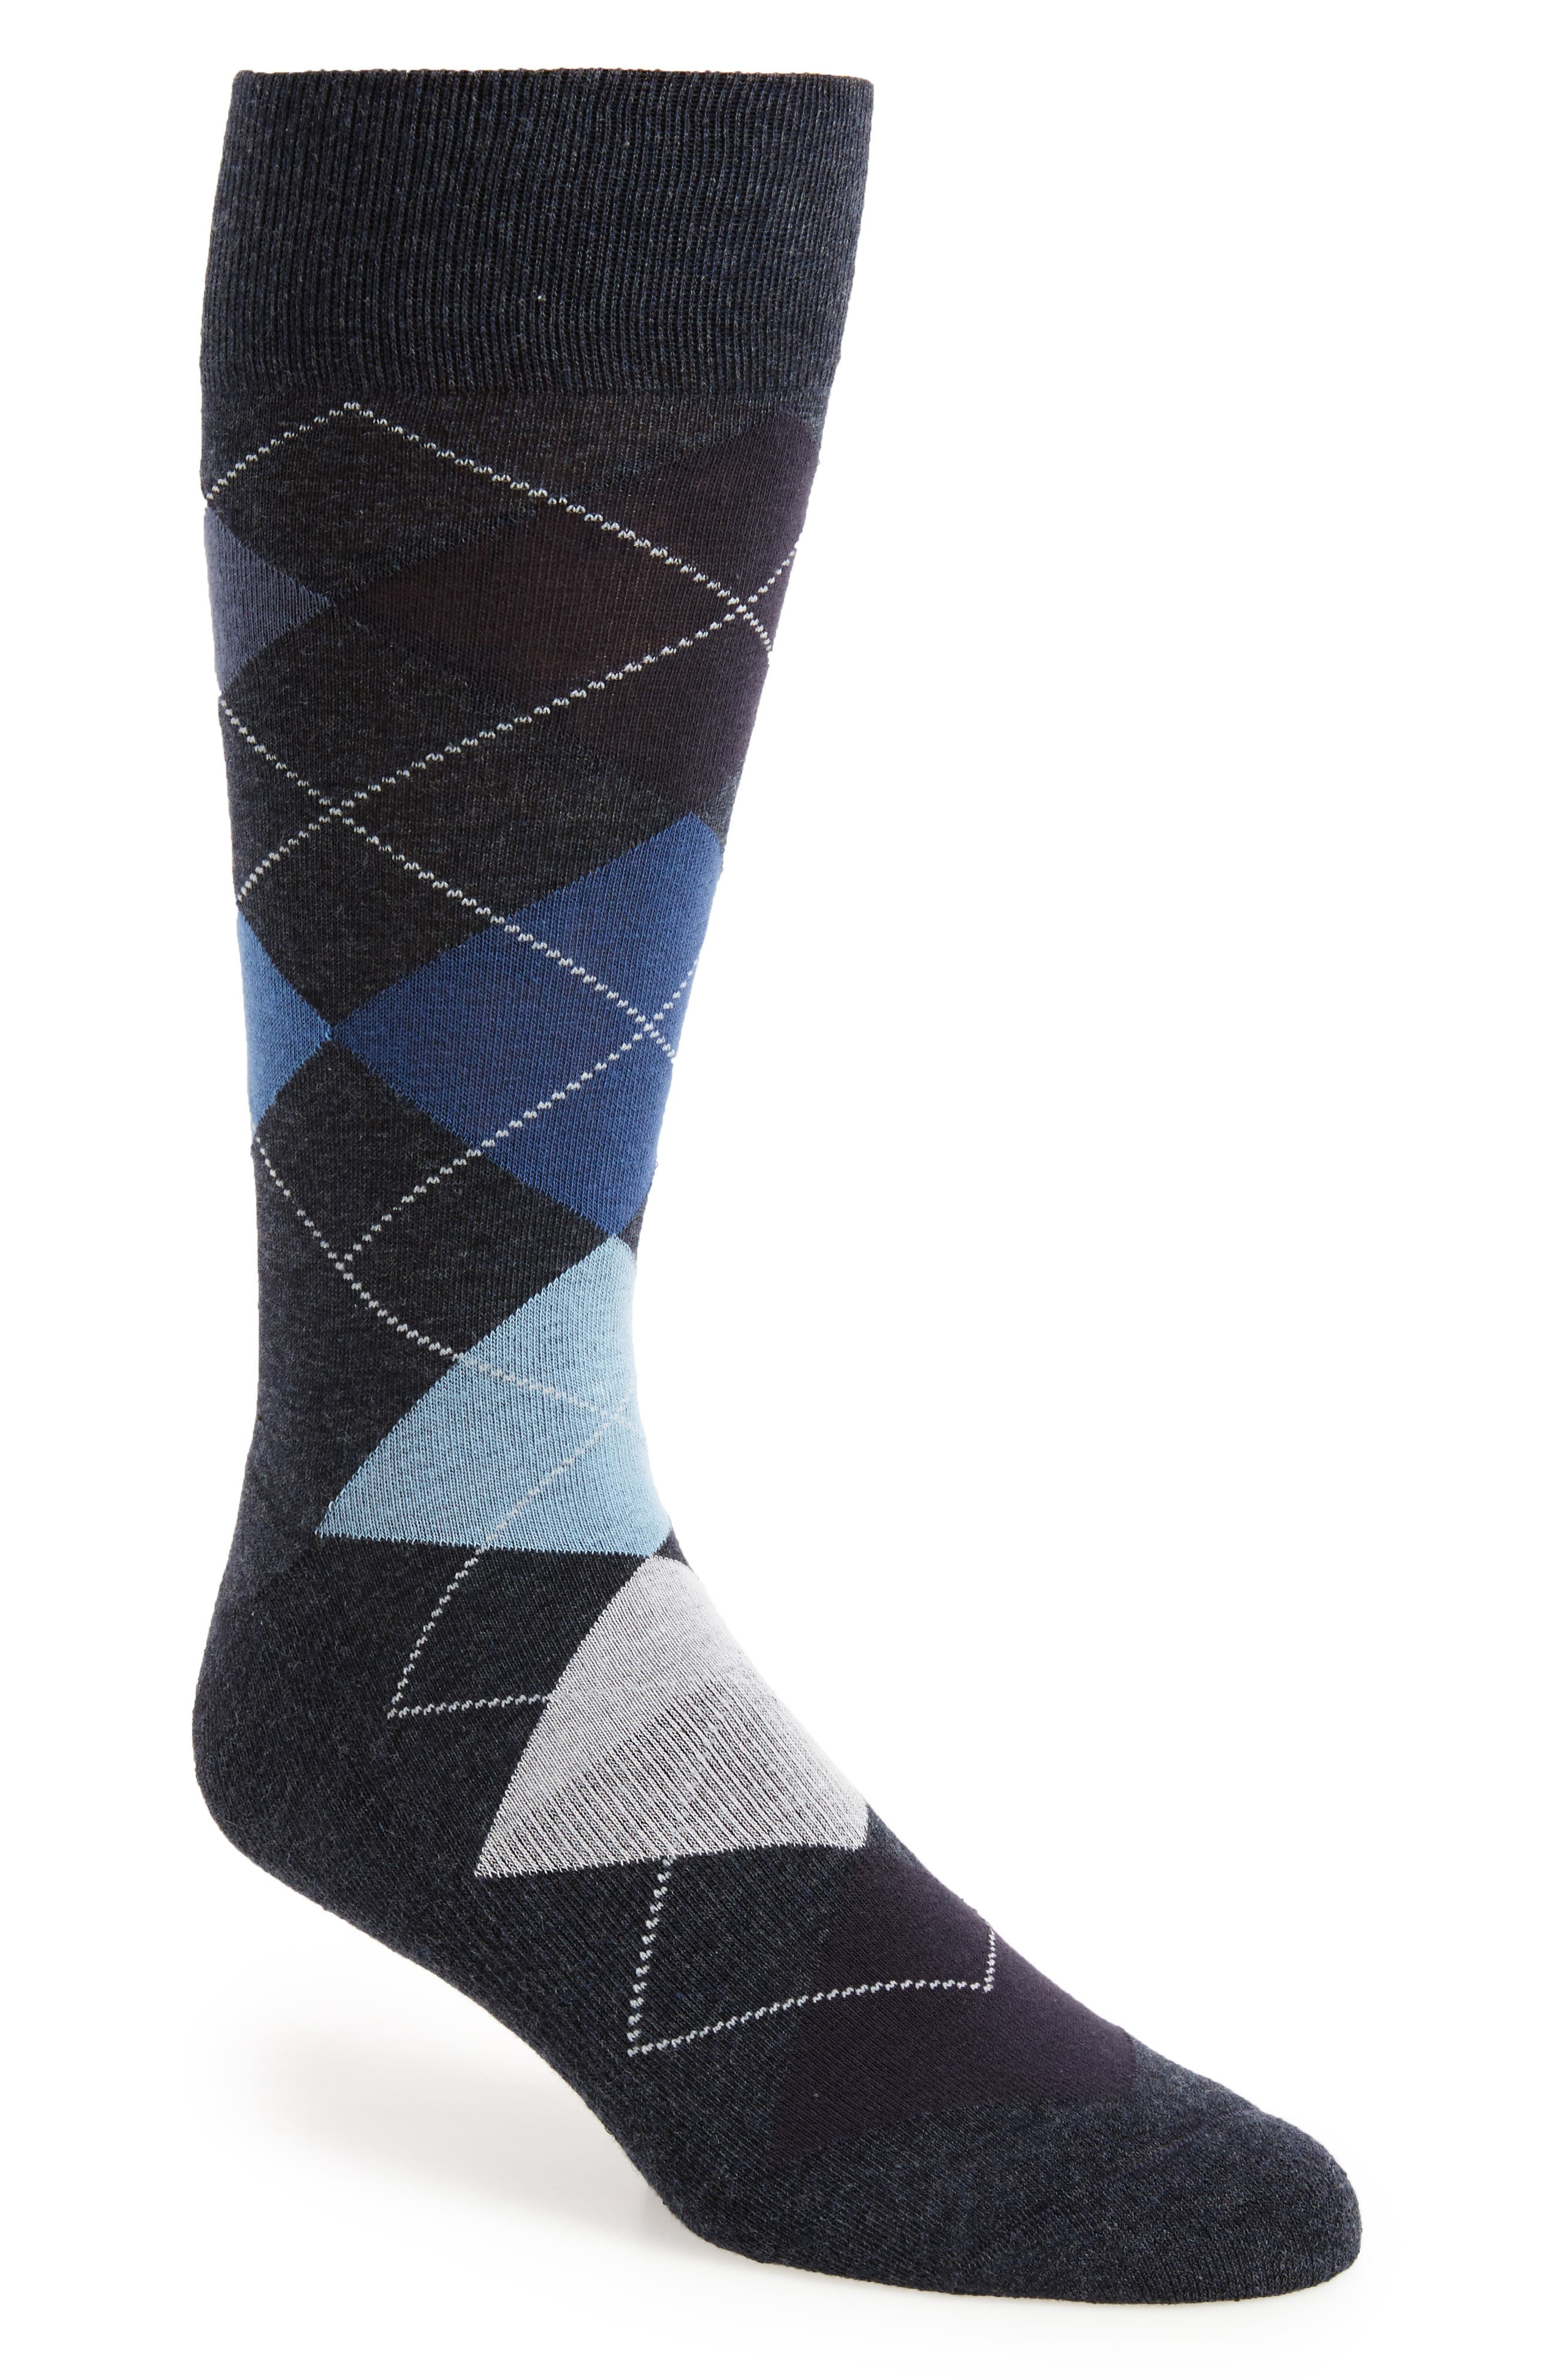 Gradient Argyle Socks,                         Main,                         color, Navy Heather